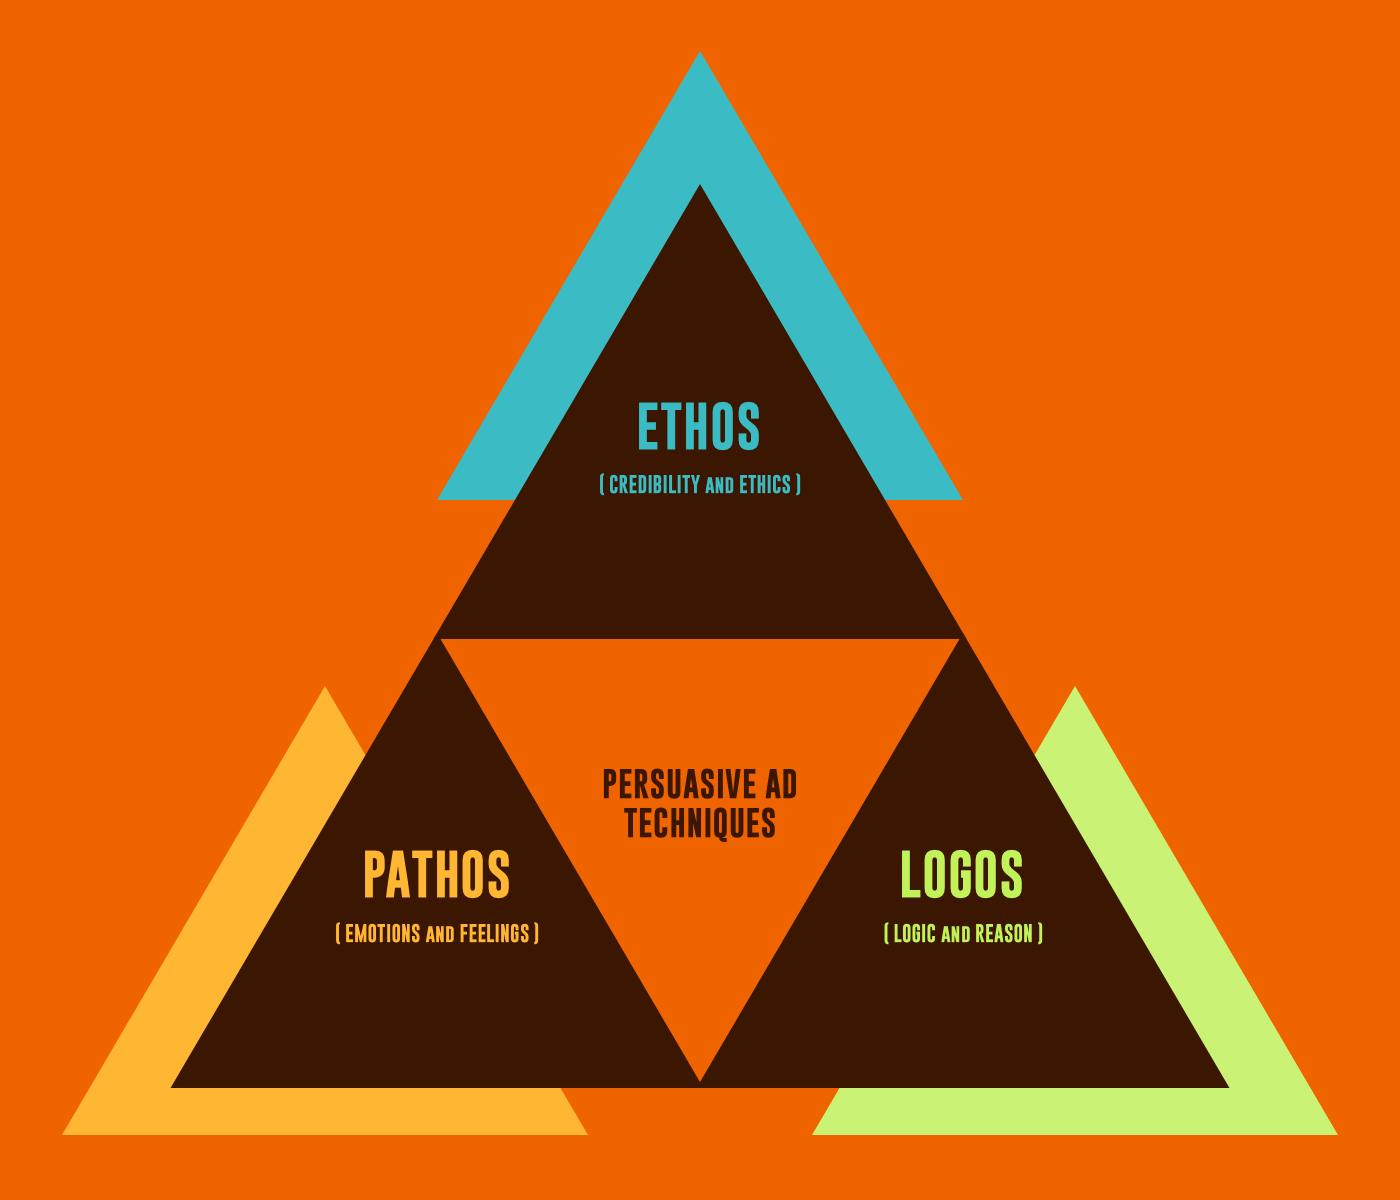 ethos pathos and logos persuasive advertising techniques